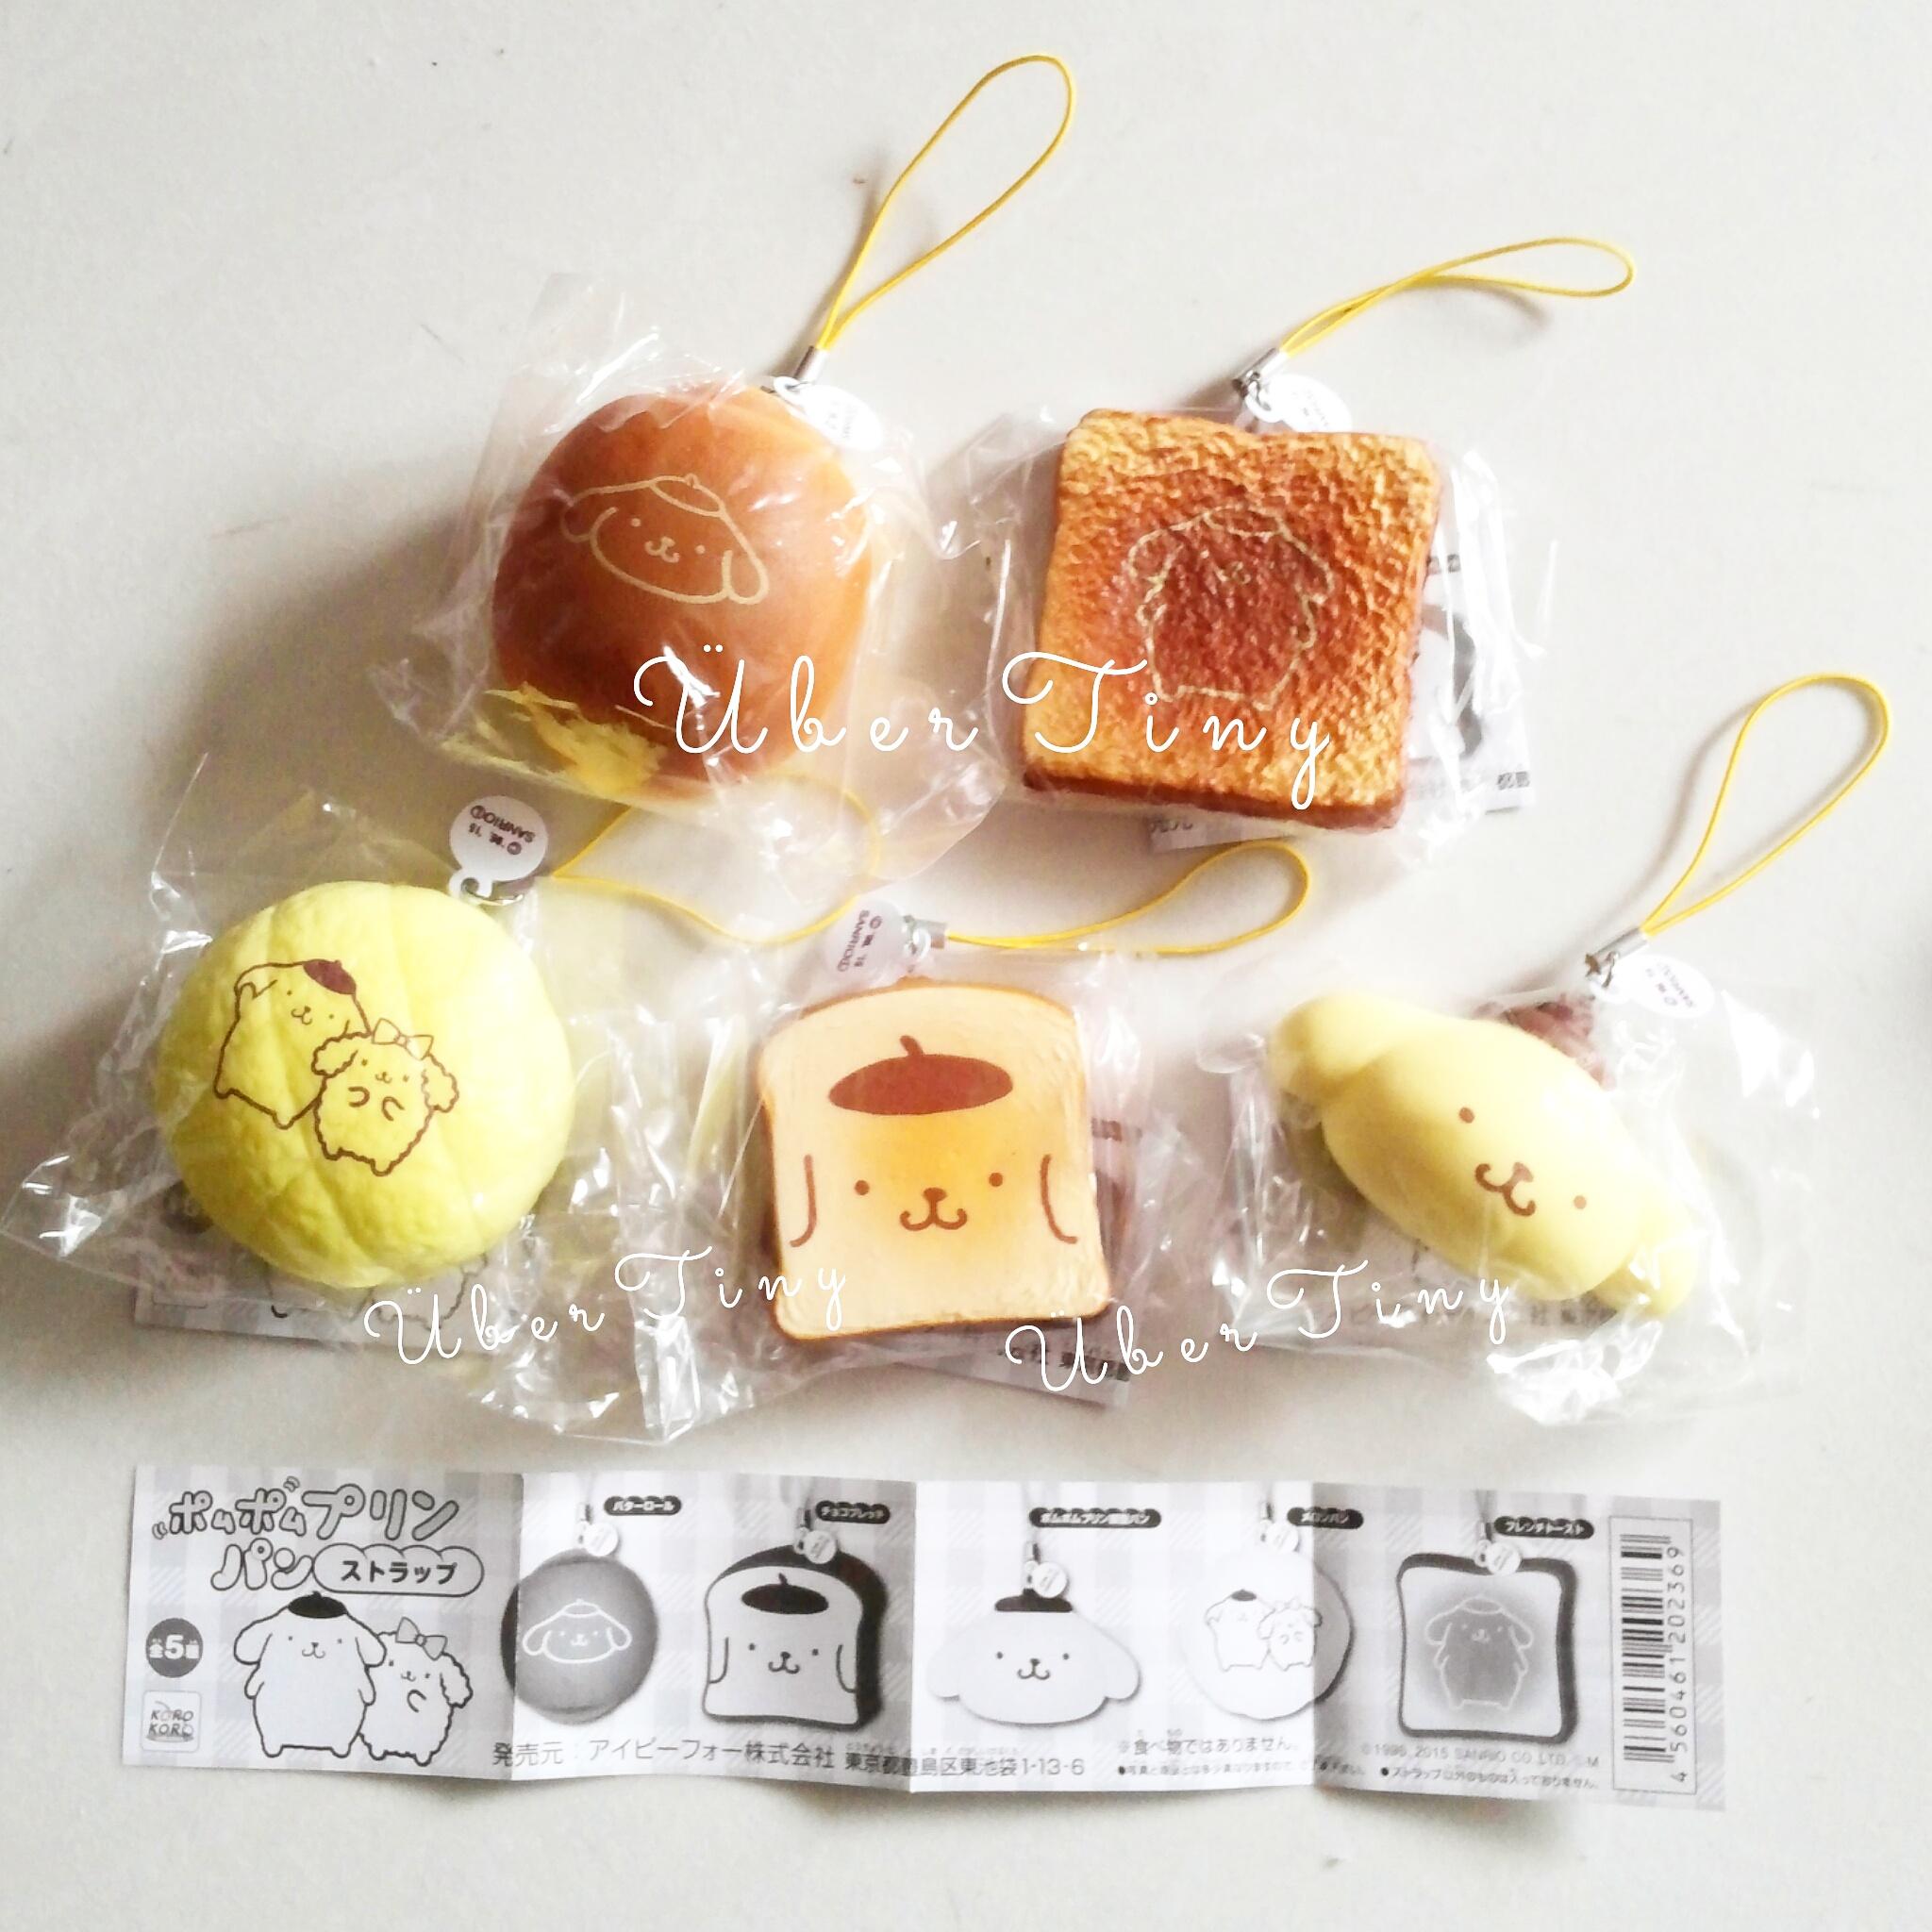 Pompompurin Squishy Bun : 5 Pom pom purin Sanrio bakery squishies (full set of 5) ? Uber Tiny ? Online Store Powered by ...